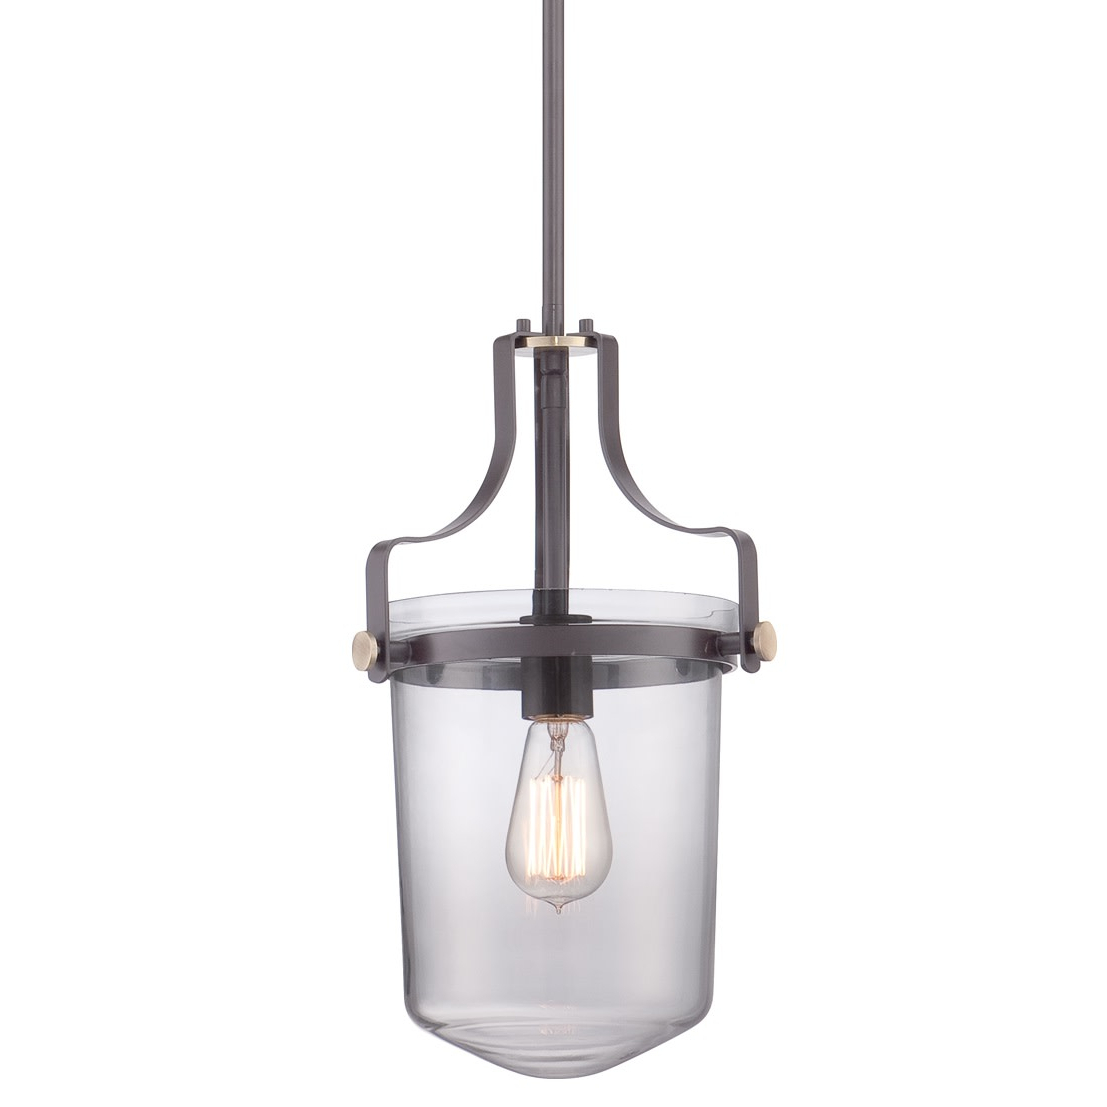 Widely Used Vintage Edison 1 Light Bowl Pendants Inside Details About Quoizel Upps1510wt Penn Station 1 Light Mini Pendant With Vintage Edison Bulb (View 14 of 20)